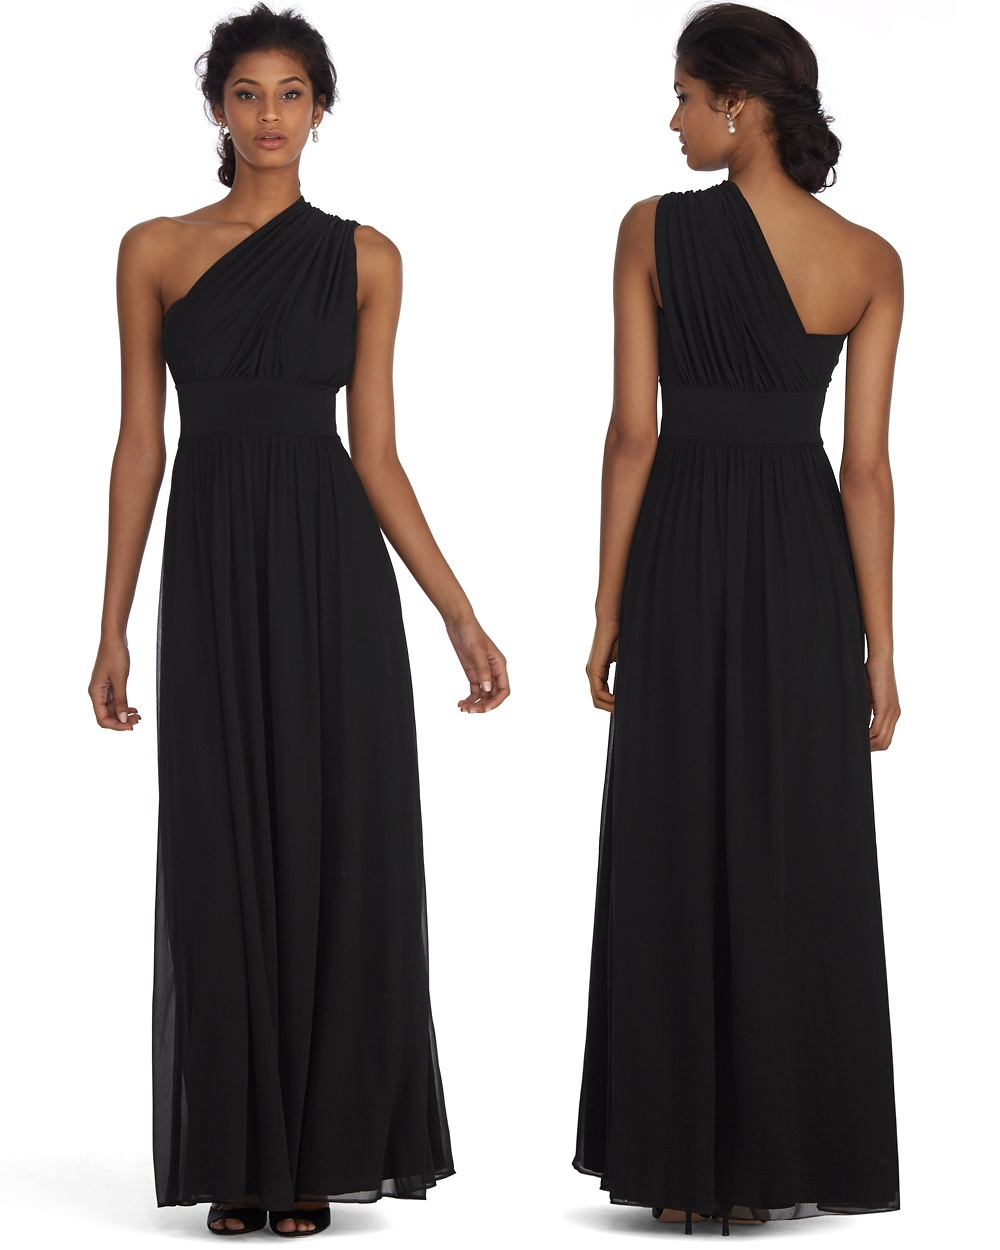 Buy used bridesmaid dresses online